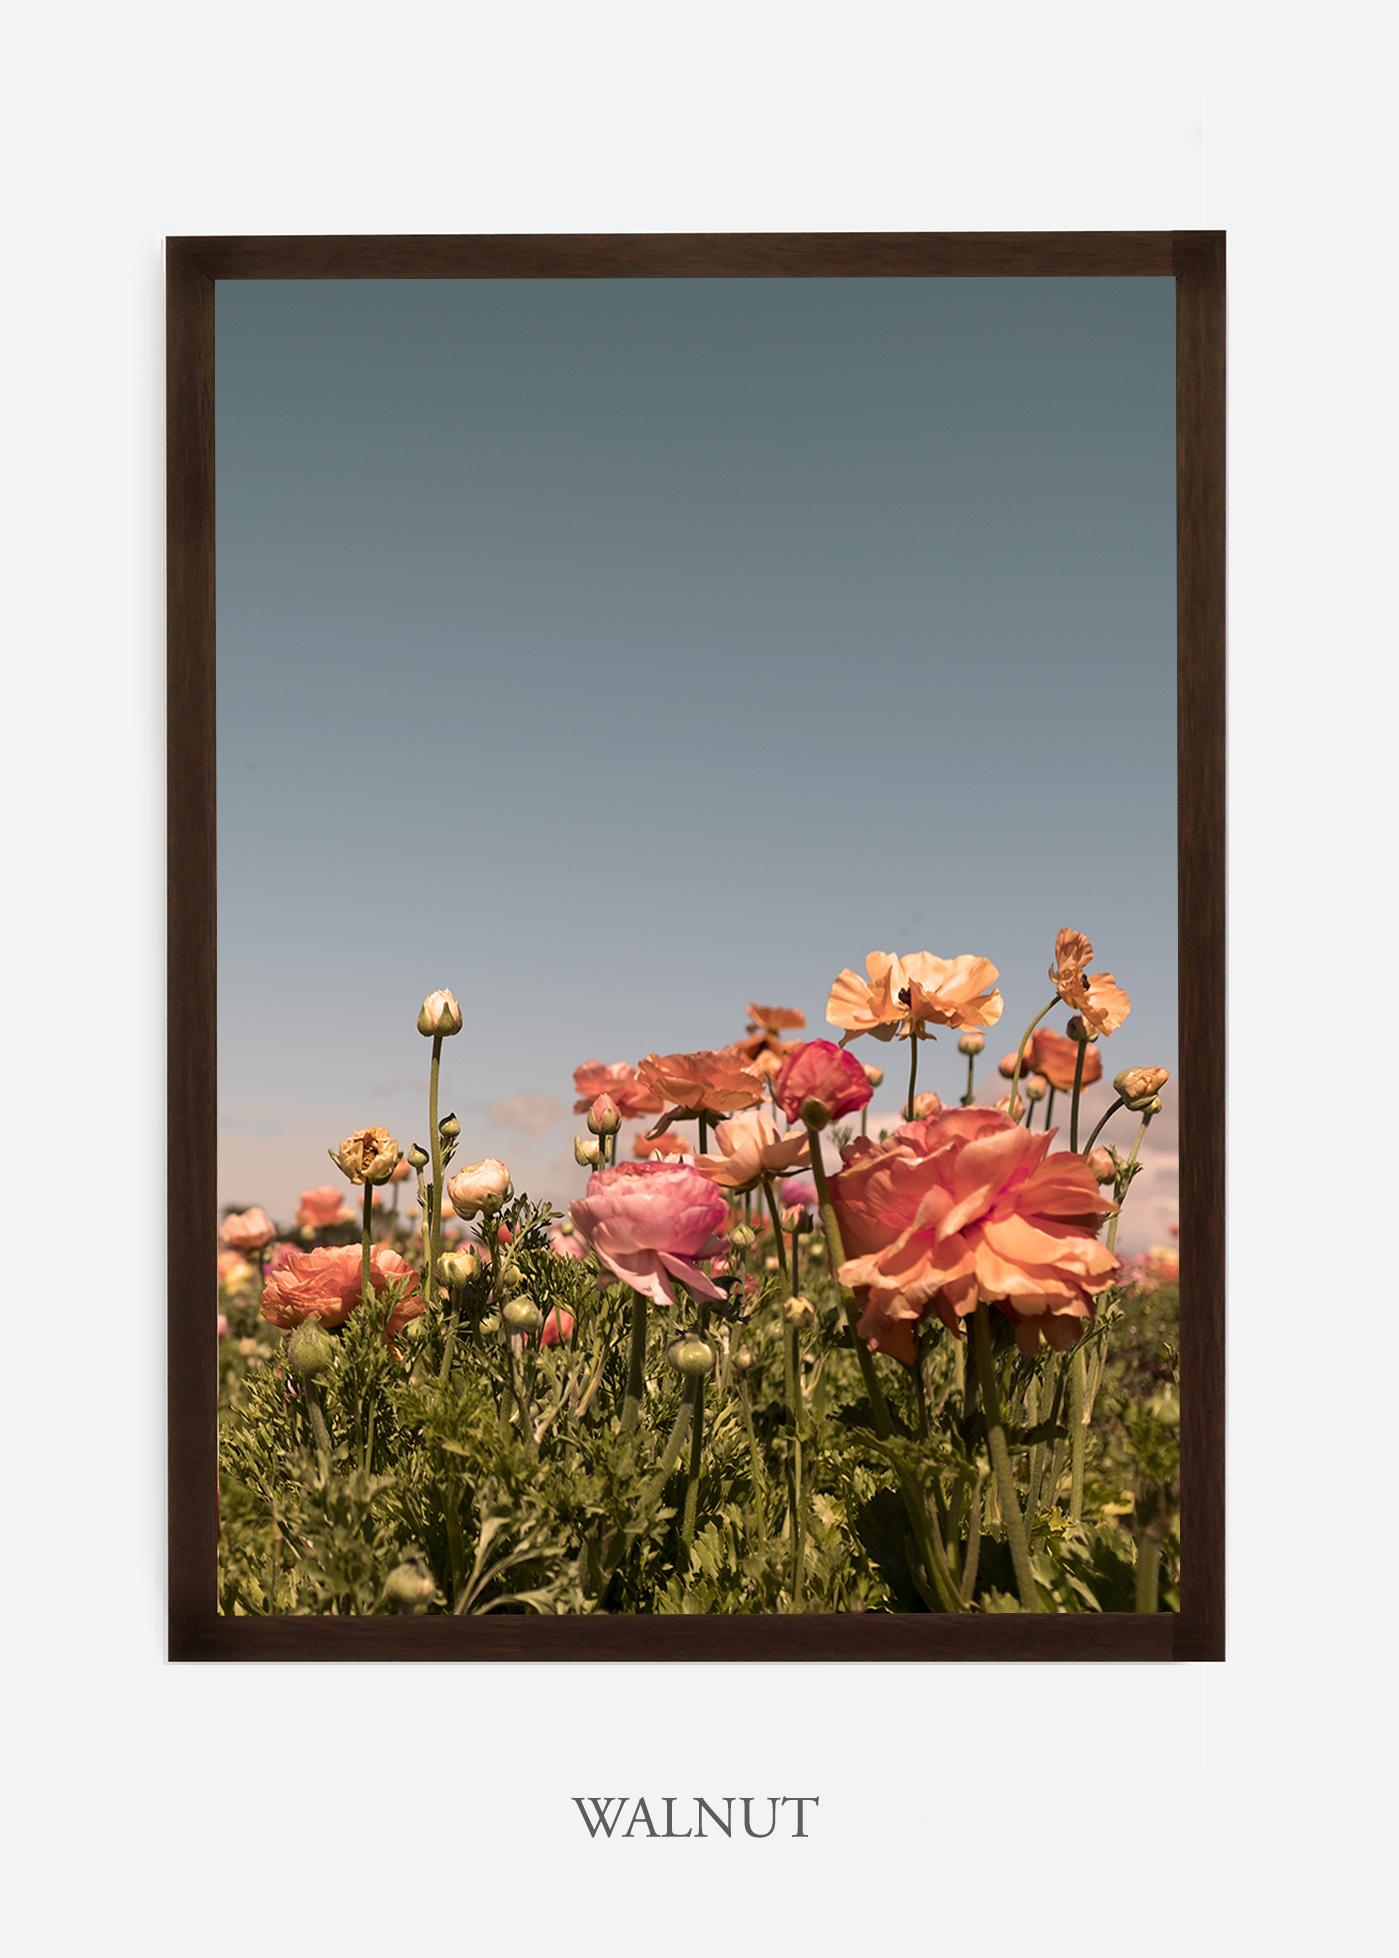 NoMat-Dark_Walnut-Frame-Floral-No-1-Wilder-California-Art-Floral-Home-decor-Prints-Dahlia-Botanical-Artwork-Interior-design.jpg